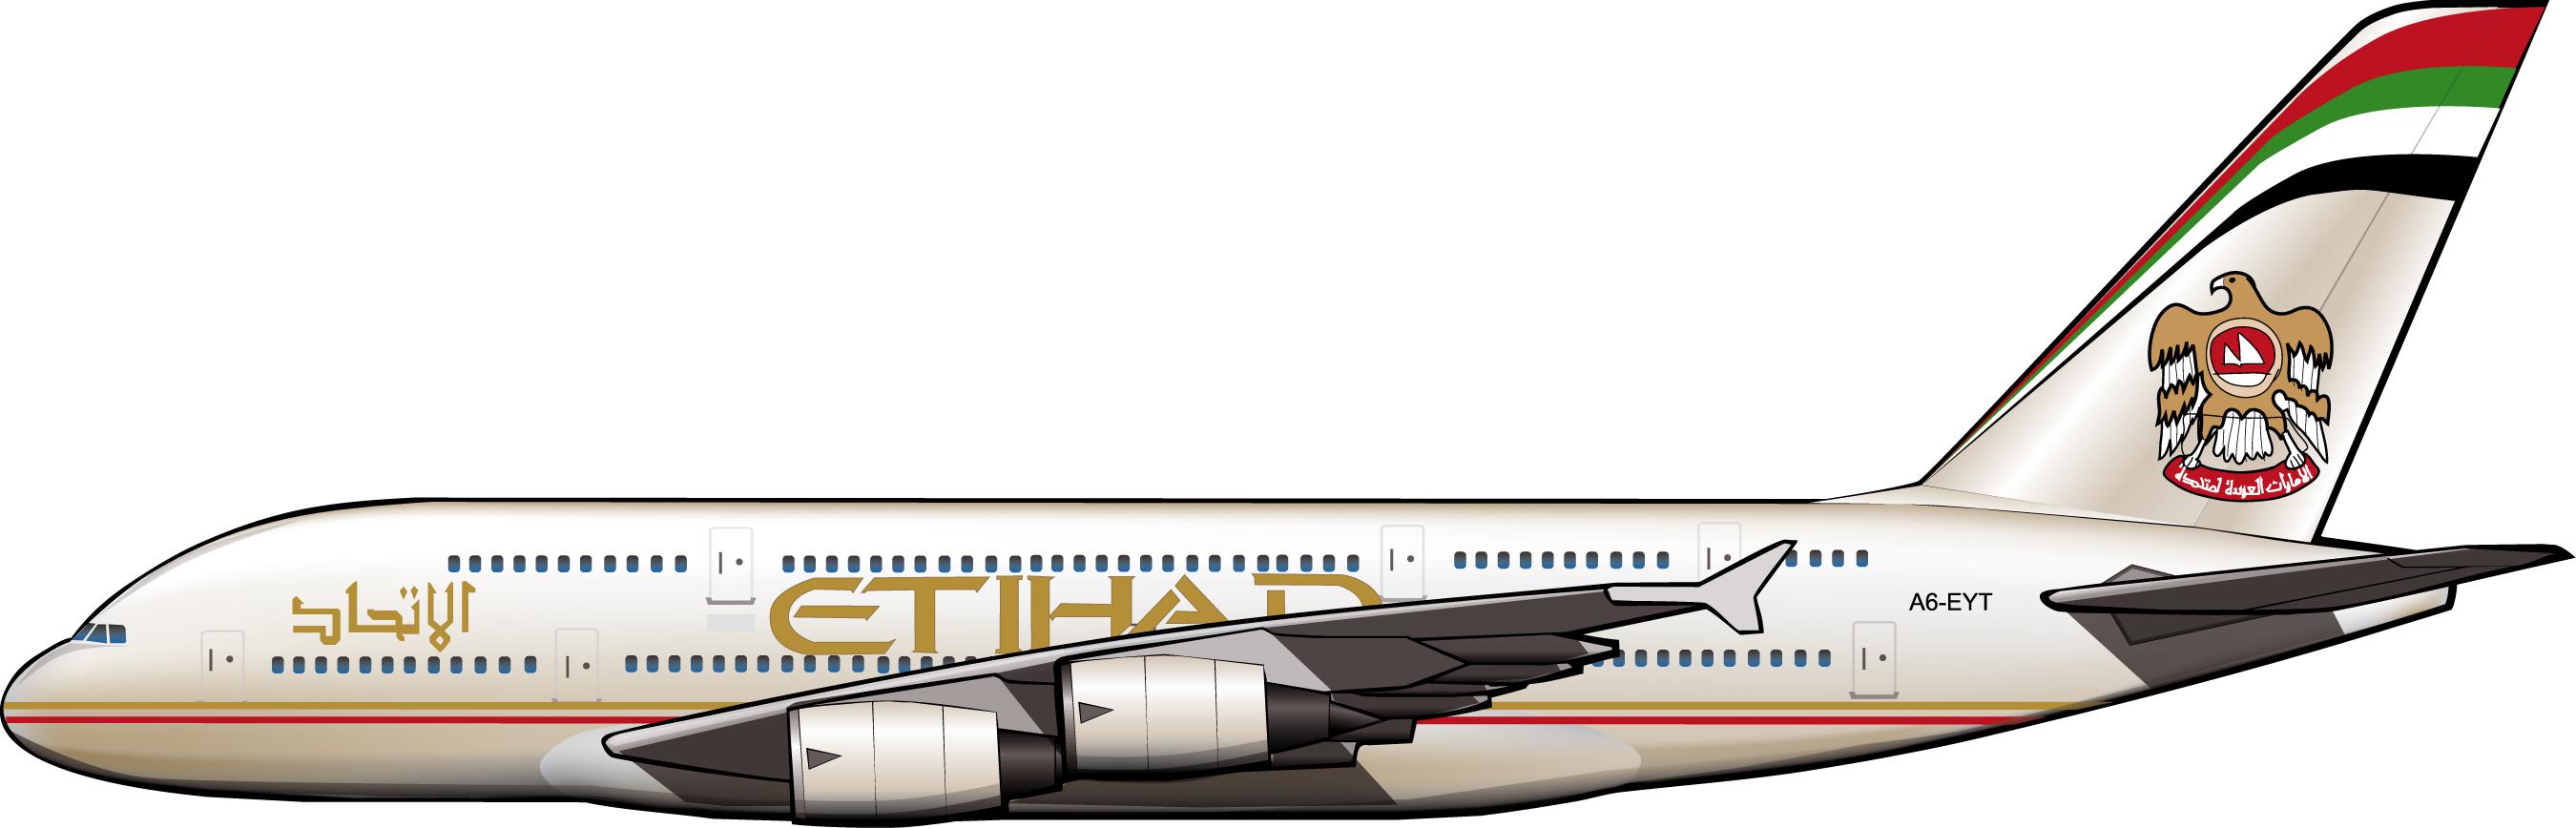 airbusa380etihad2014